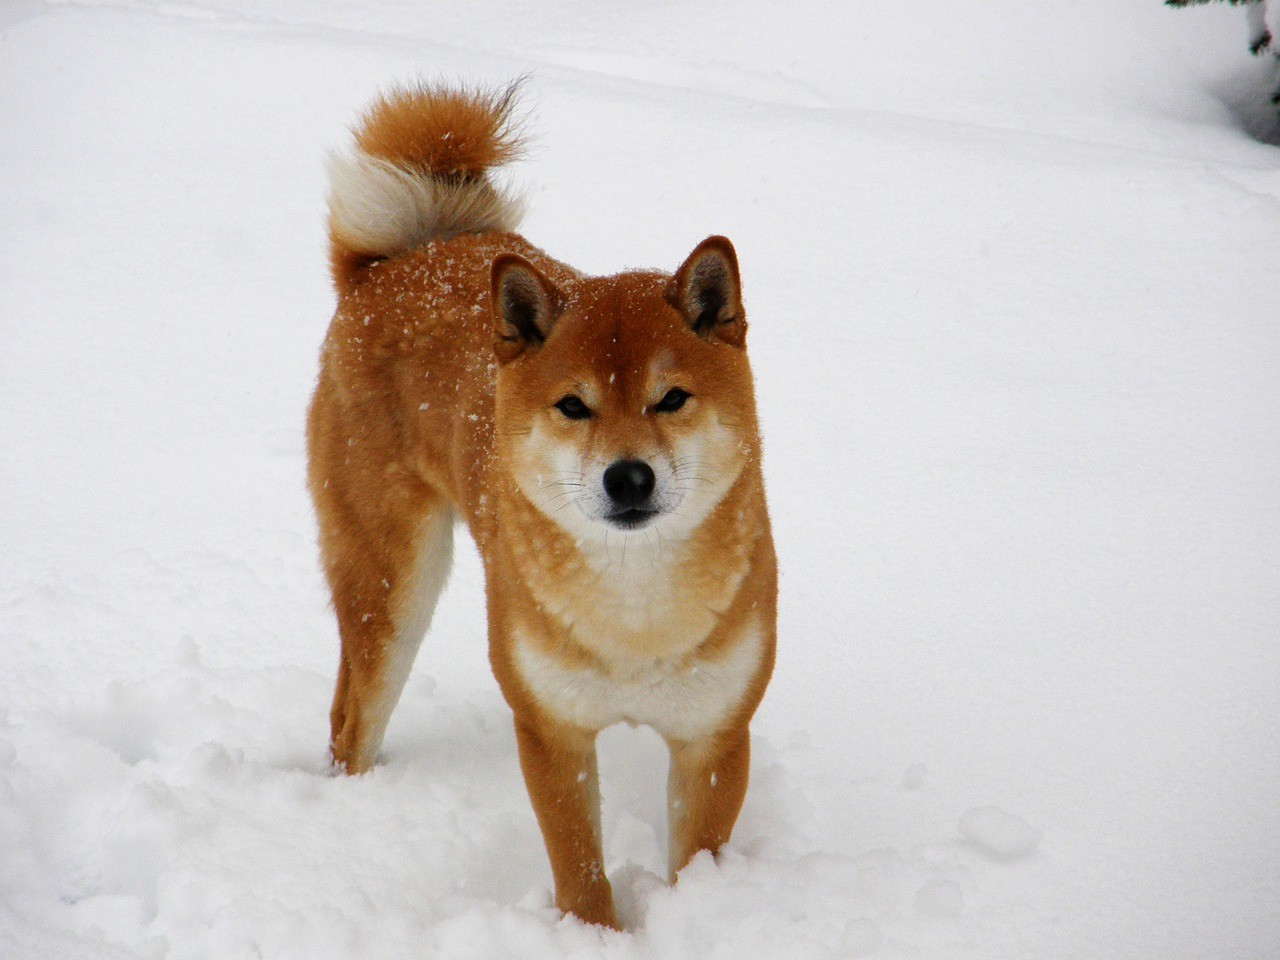 Un adorable compagnon : le shiba inu